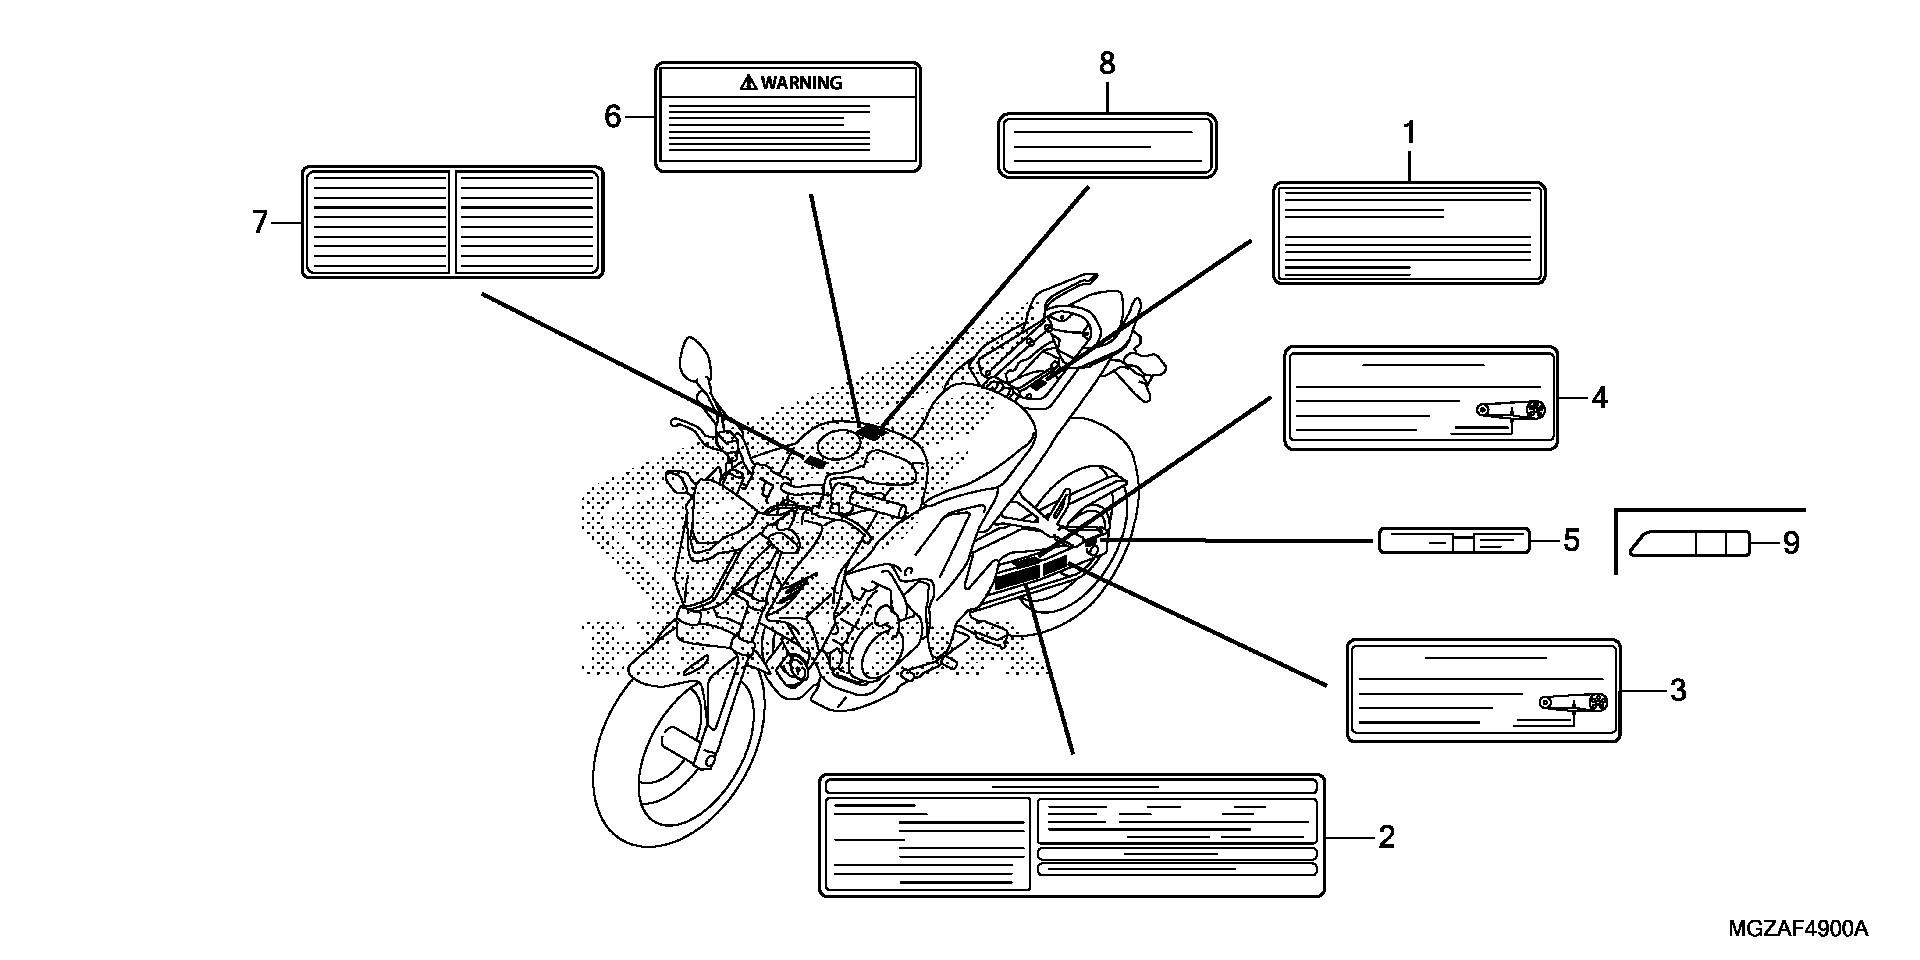 Honda Oem Part 87508